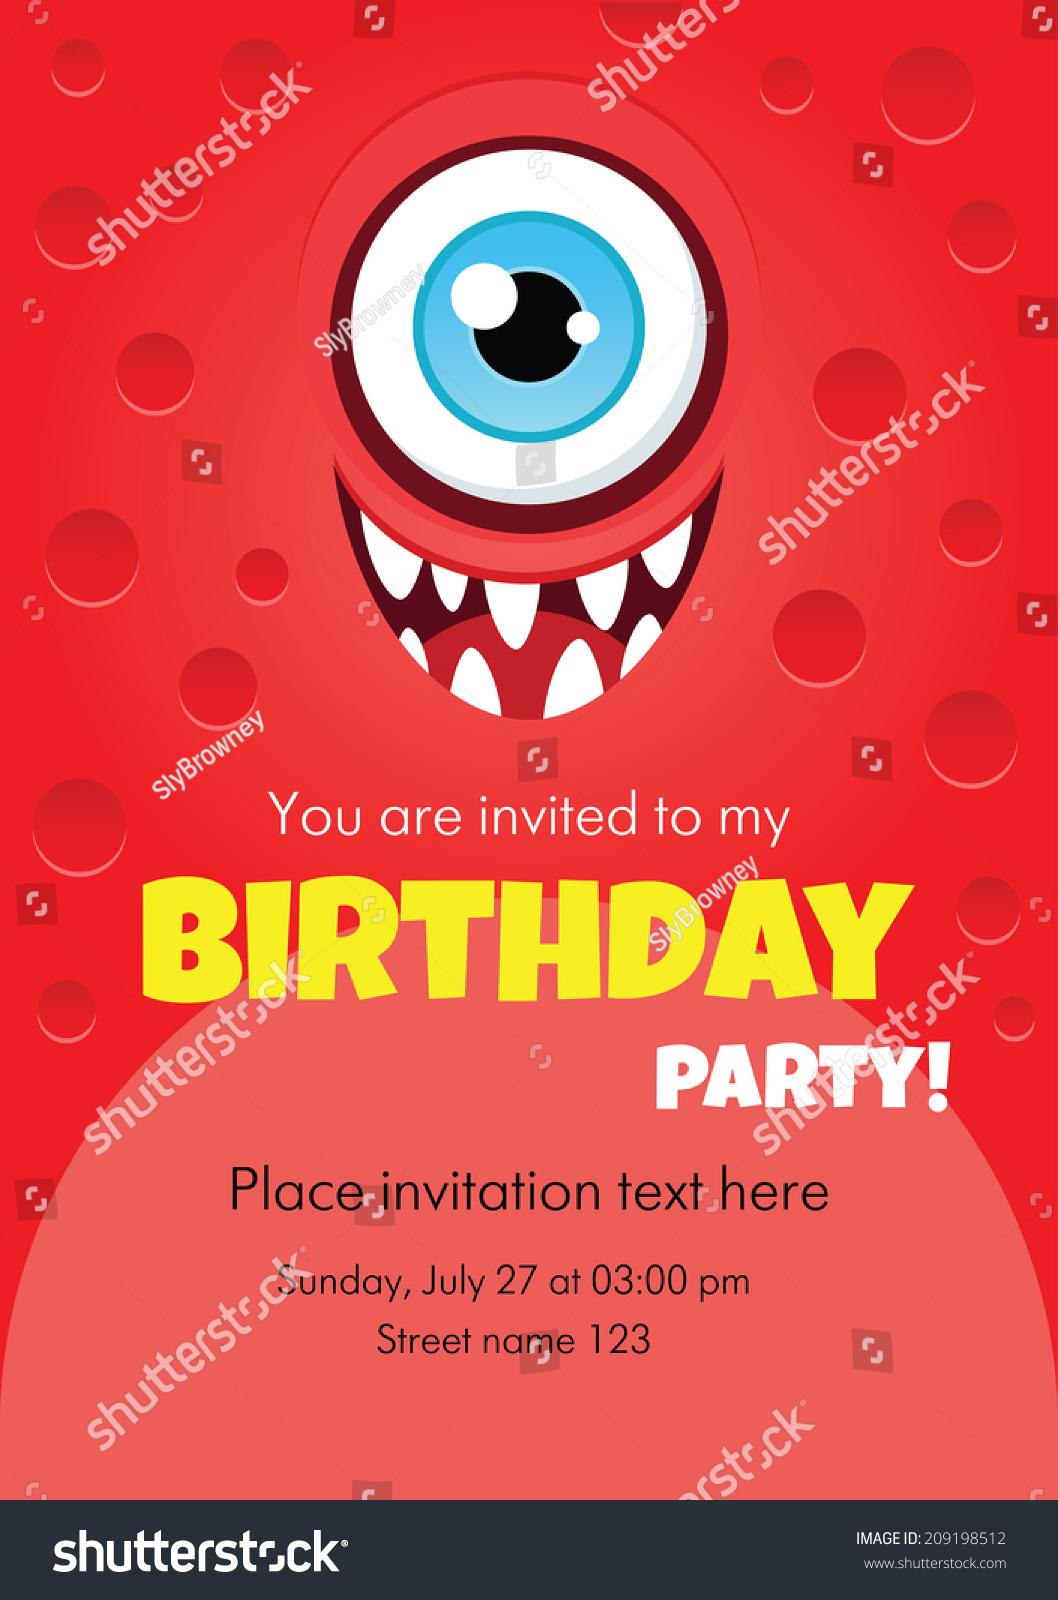 Vector Birthday Invitation Card Funny Cartoon Stock Vector (Royalty ...